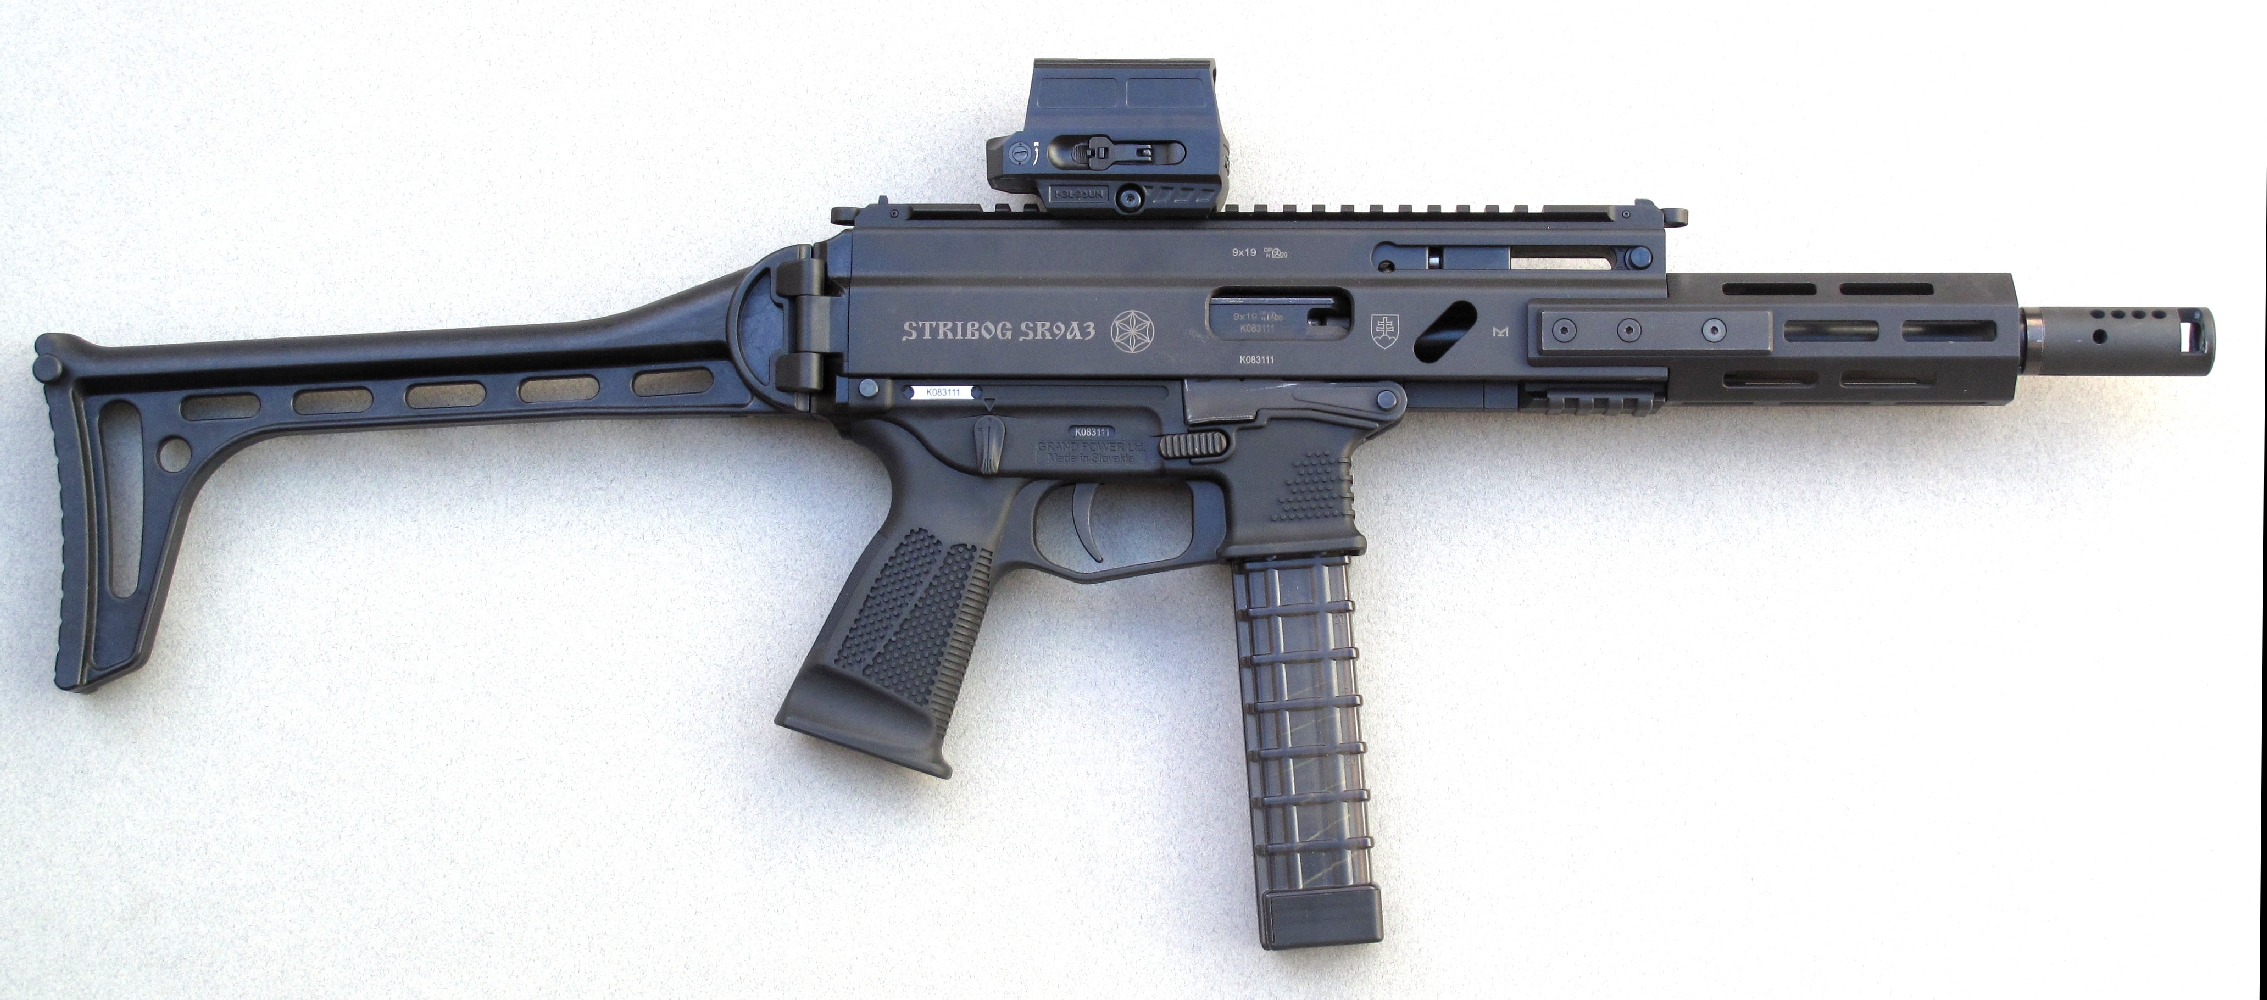 Carabine semi-automatique Grand Power Stribog SR9A3 en calibre 9mm Parabellum